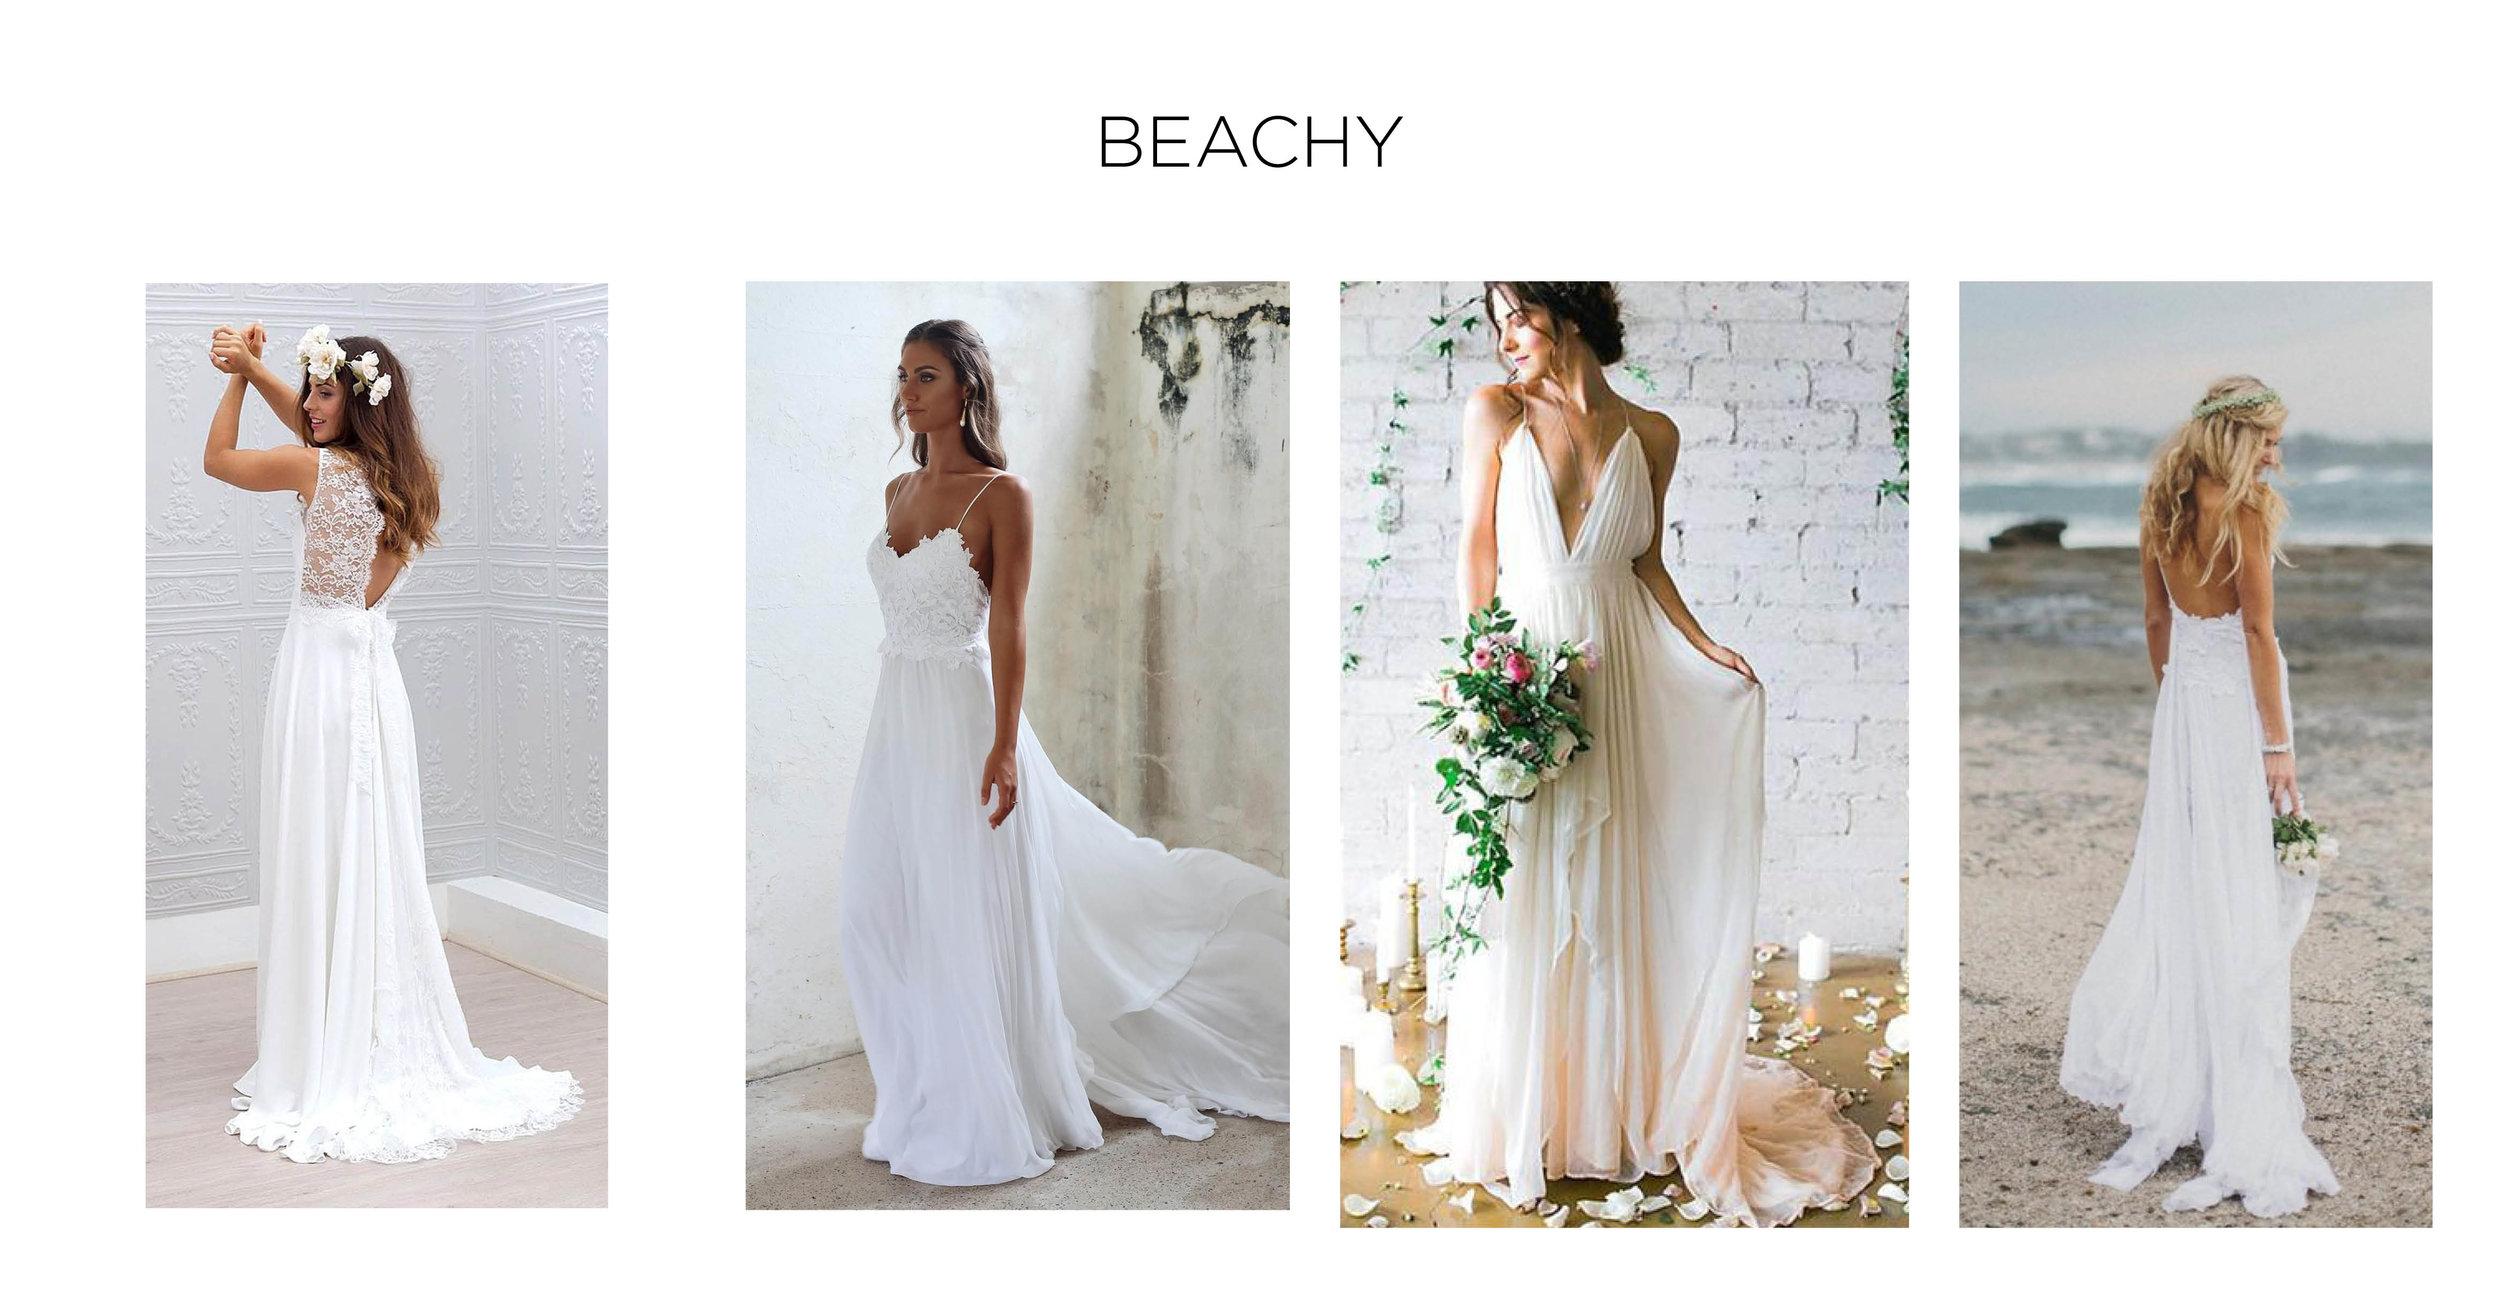 beachy wedding maxi dress wedding majorca wedding planner wedding dress mallorca wedding dresses .jpg